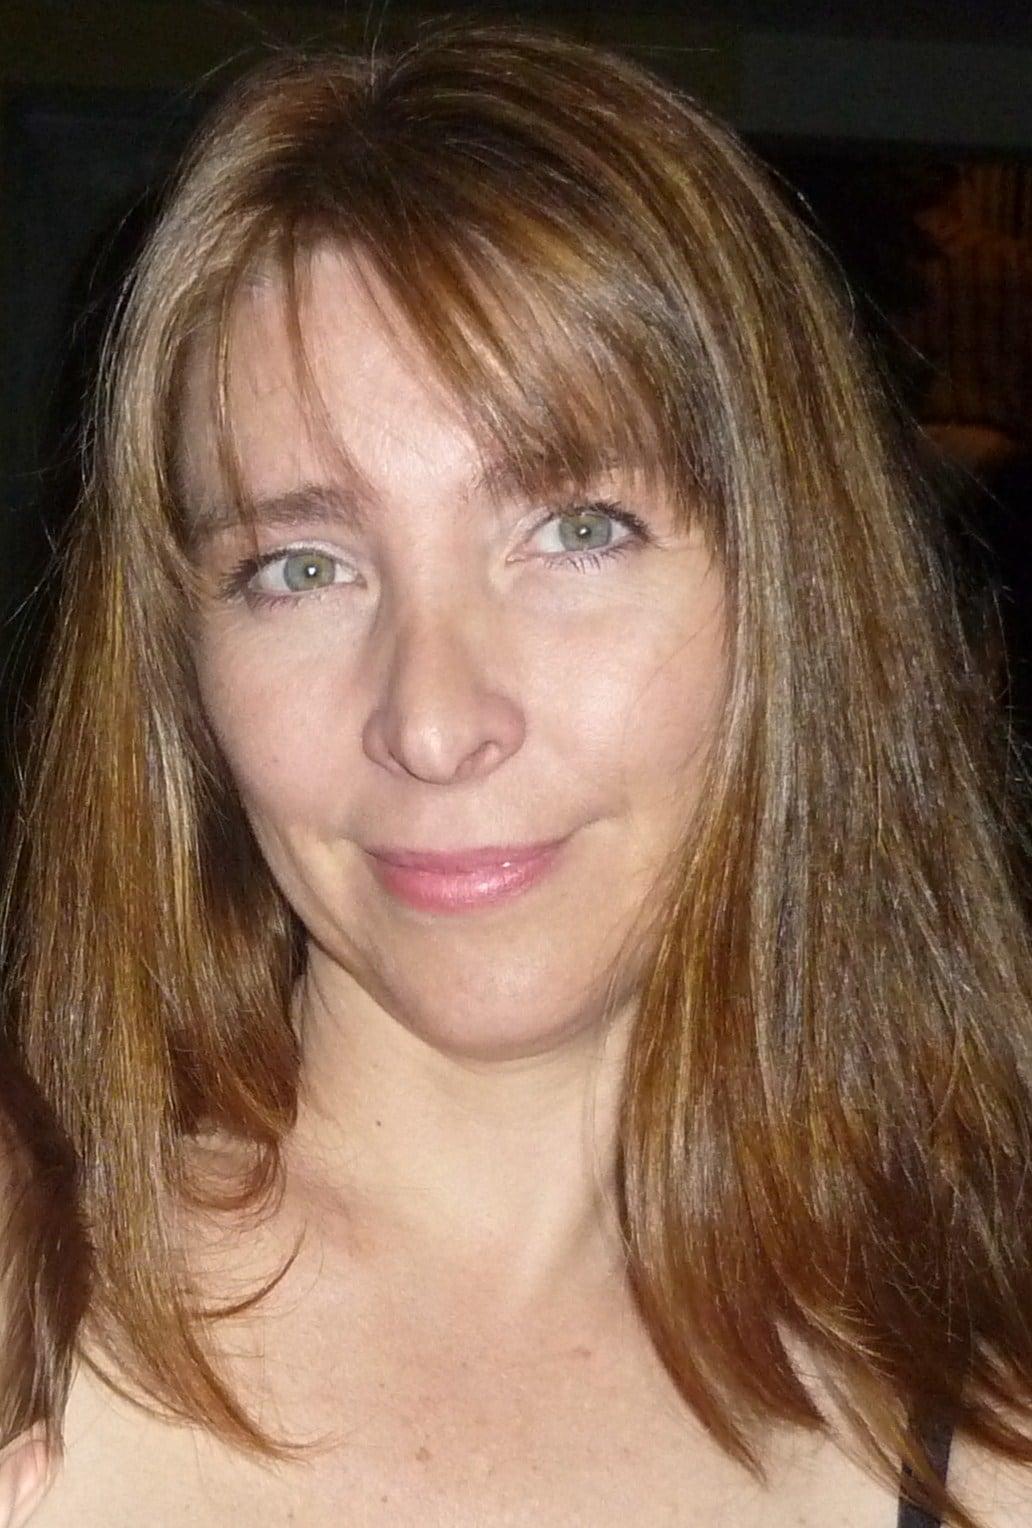 Carola From Merlo, Argentina